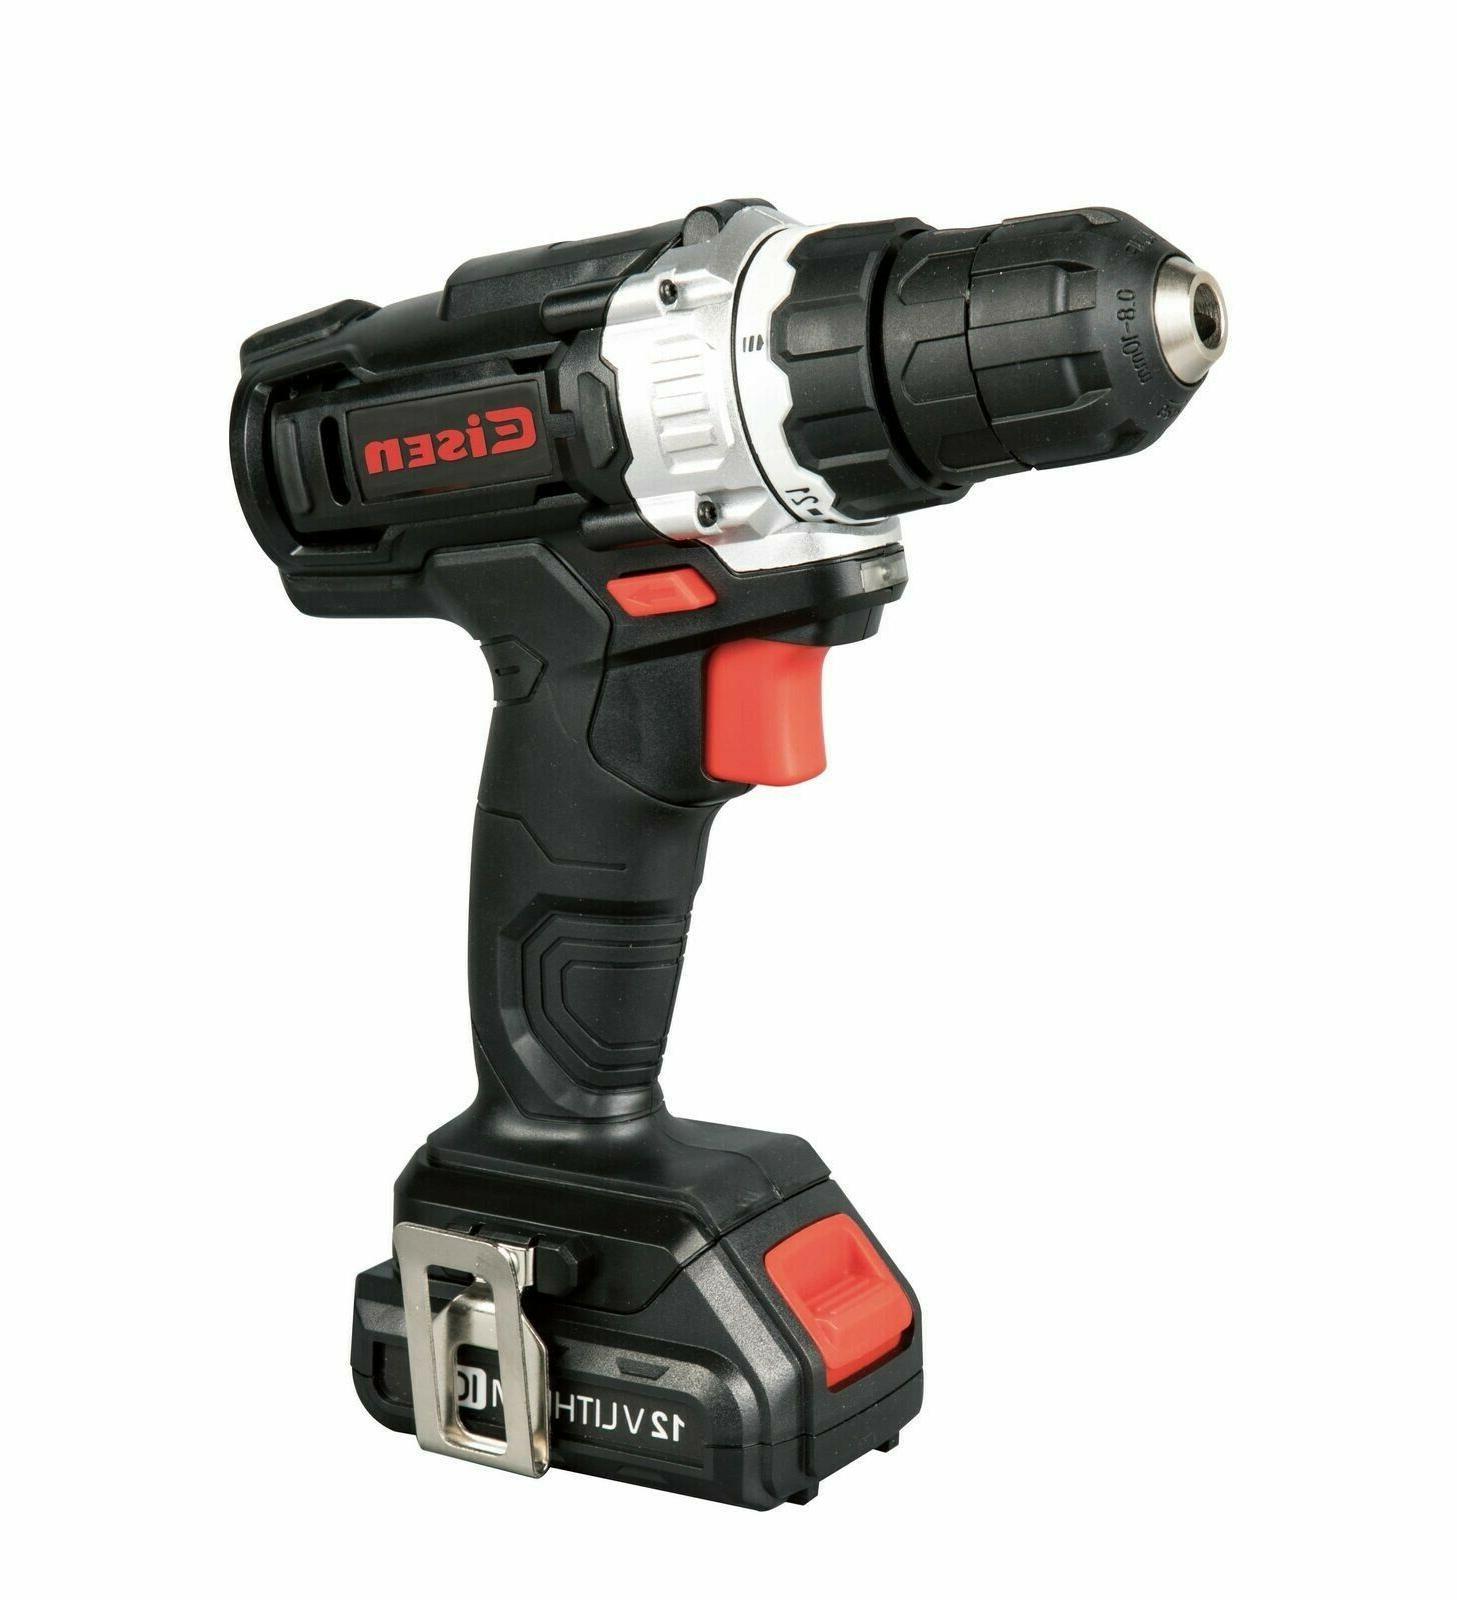 12v cordless 3 8 cordless drill 700